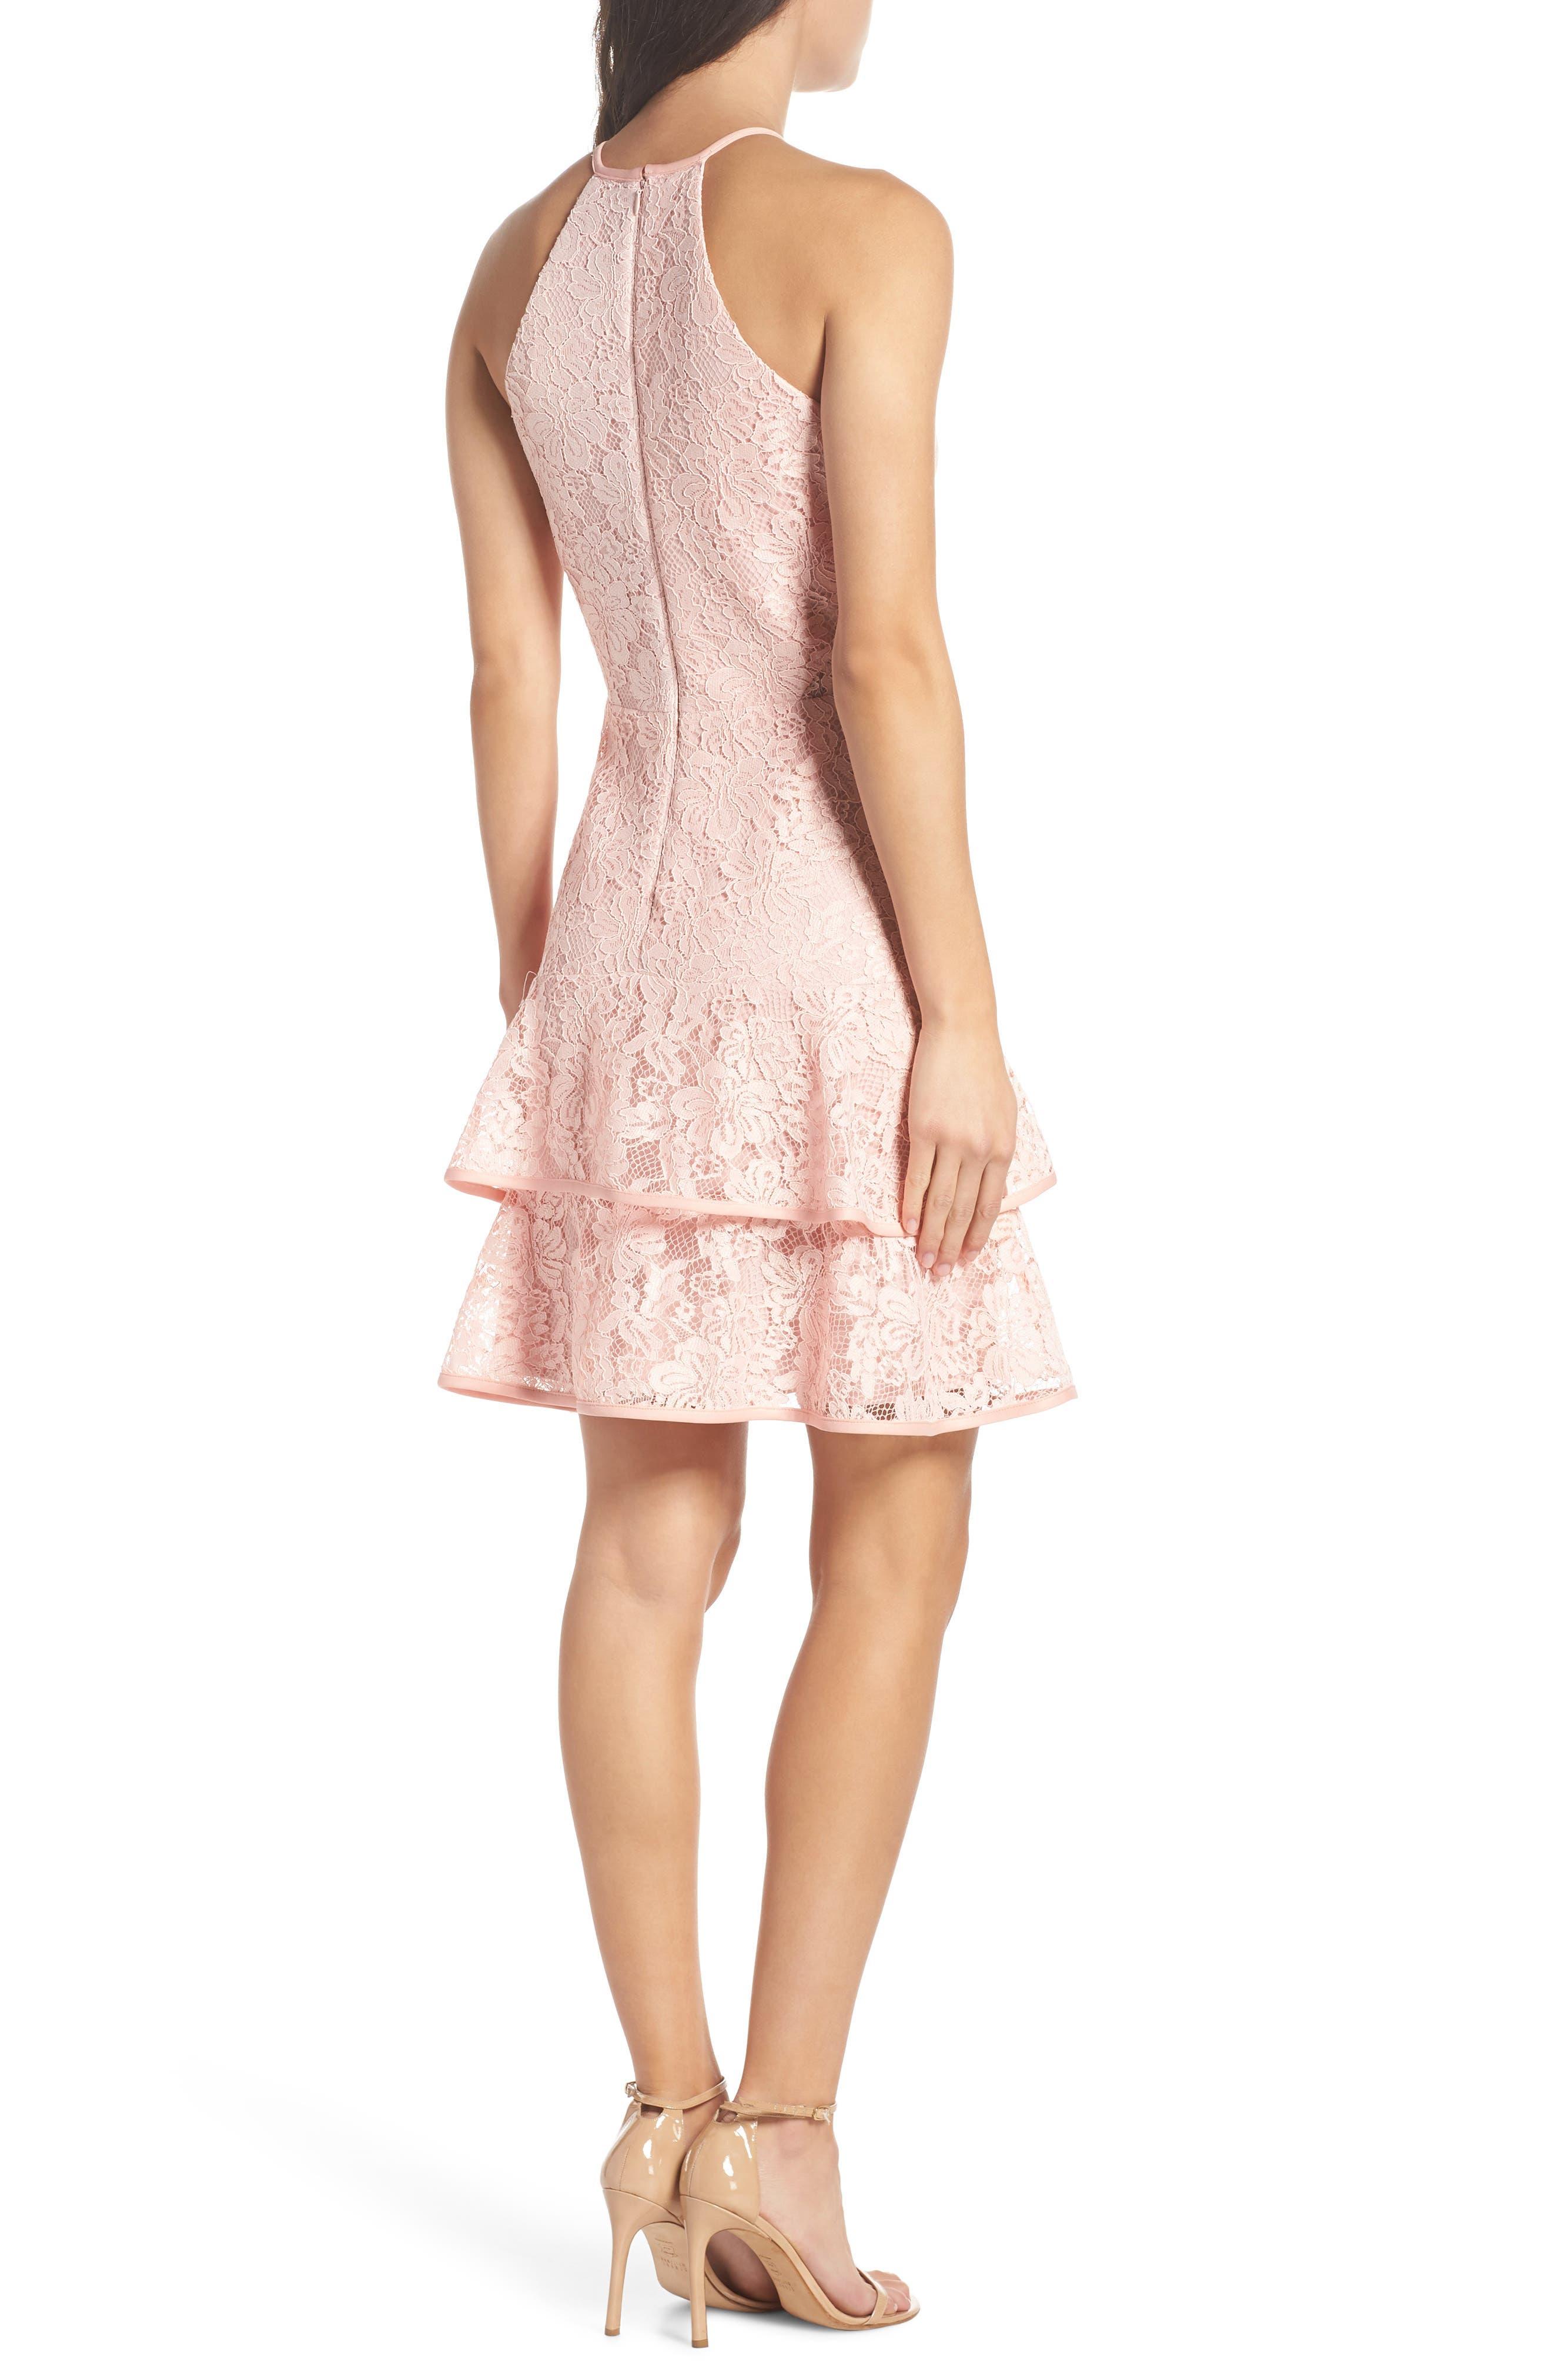 Ruffle Tier Lace Party Dress,                             Alternate thumbnail 2, color,                             Blush